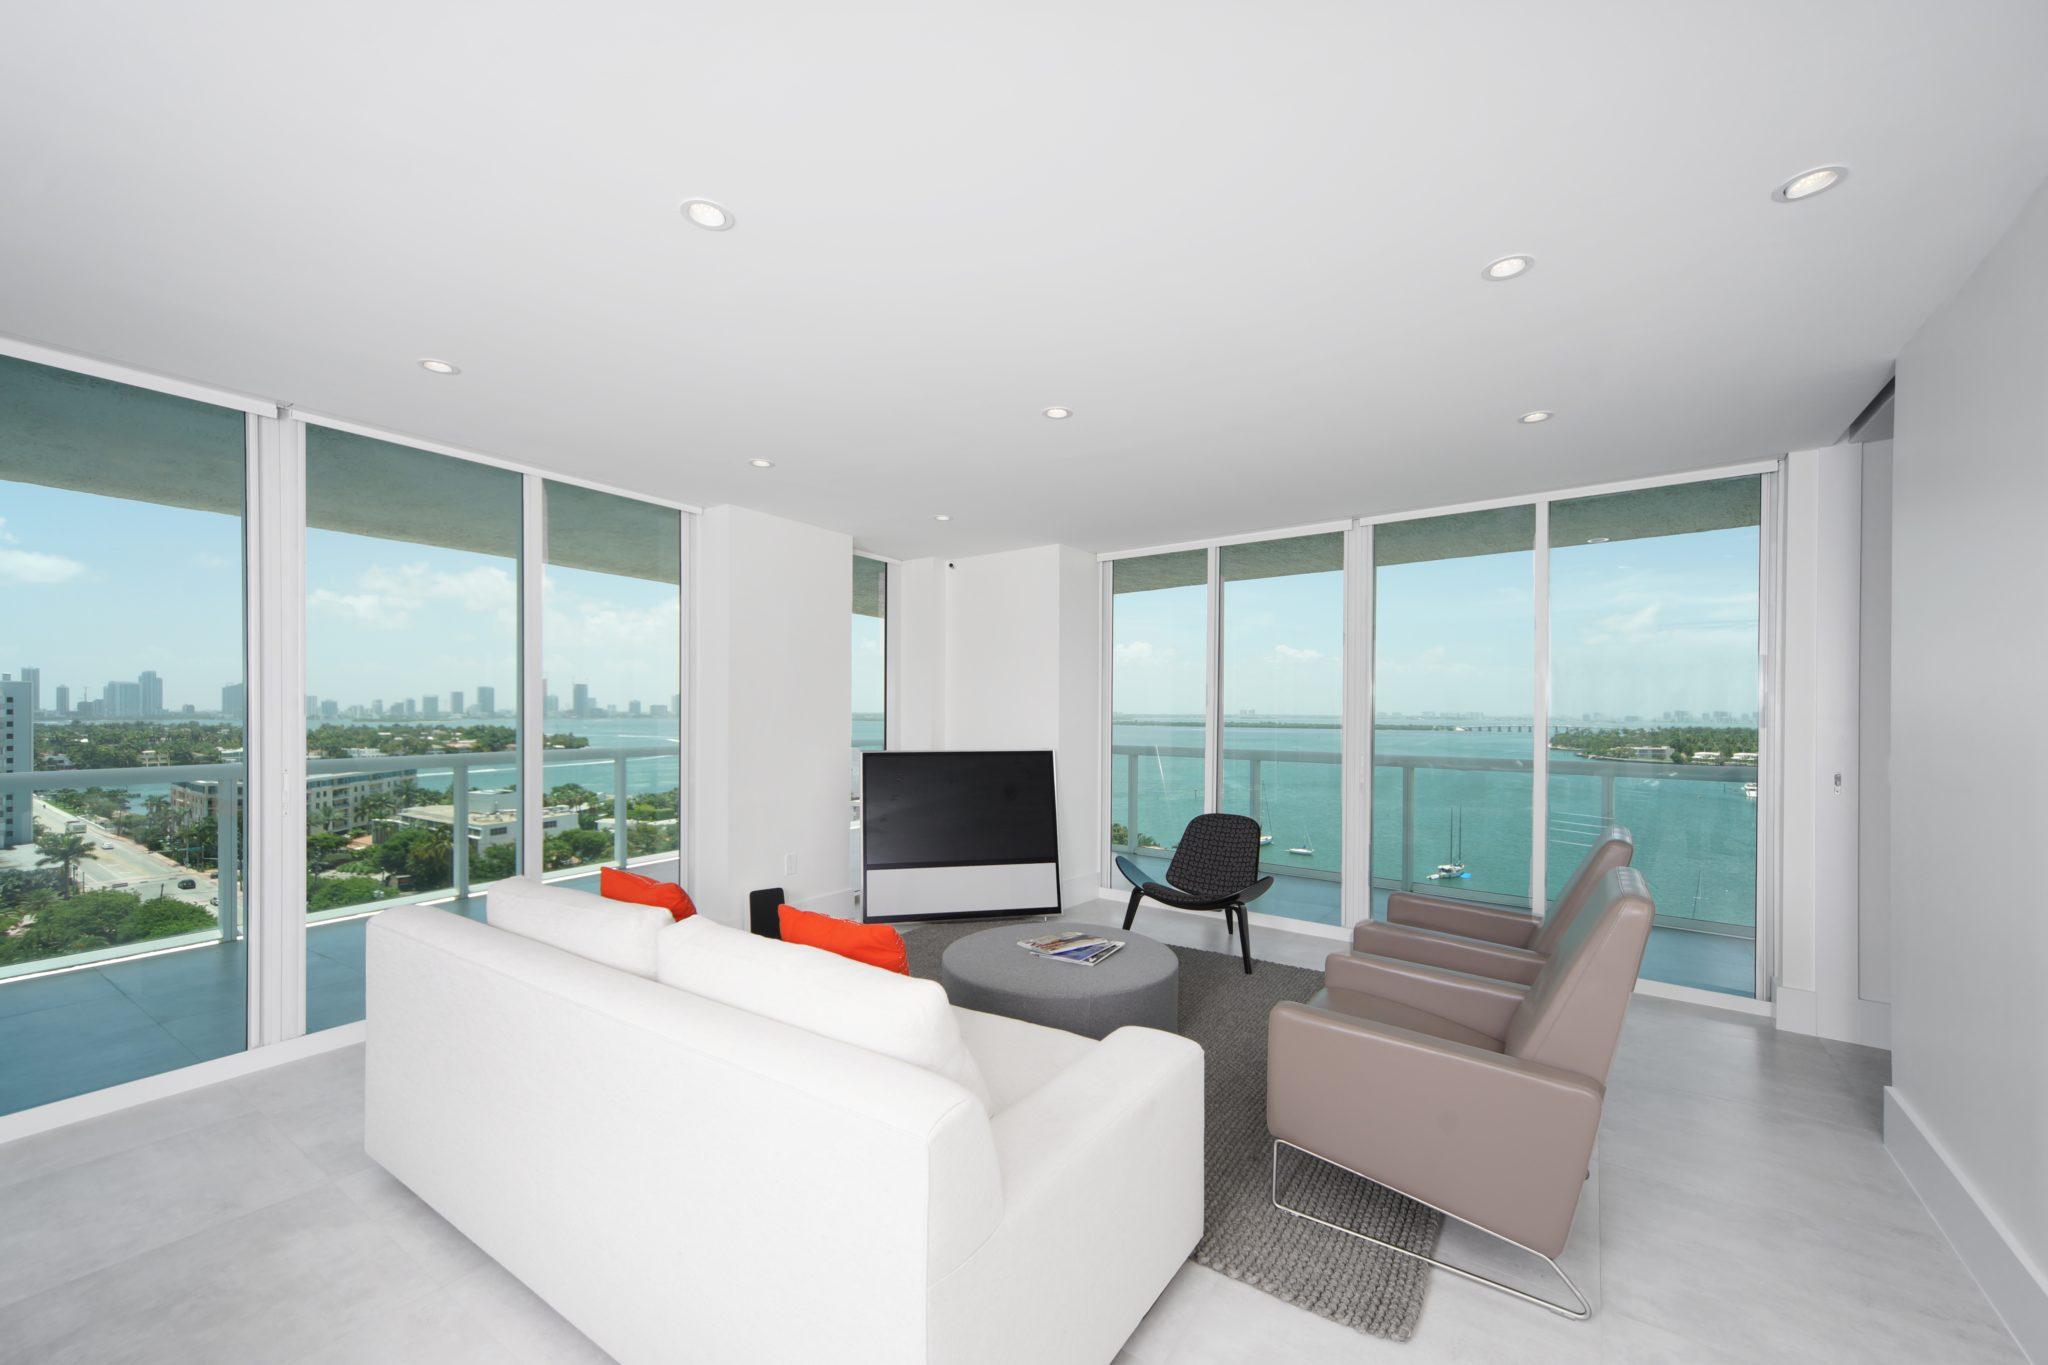 Venetian Islands Condominium Living Room with Wraparound Balcony by DiMare Design